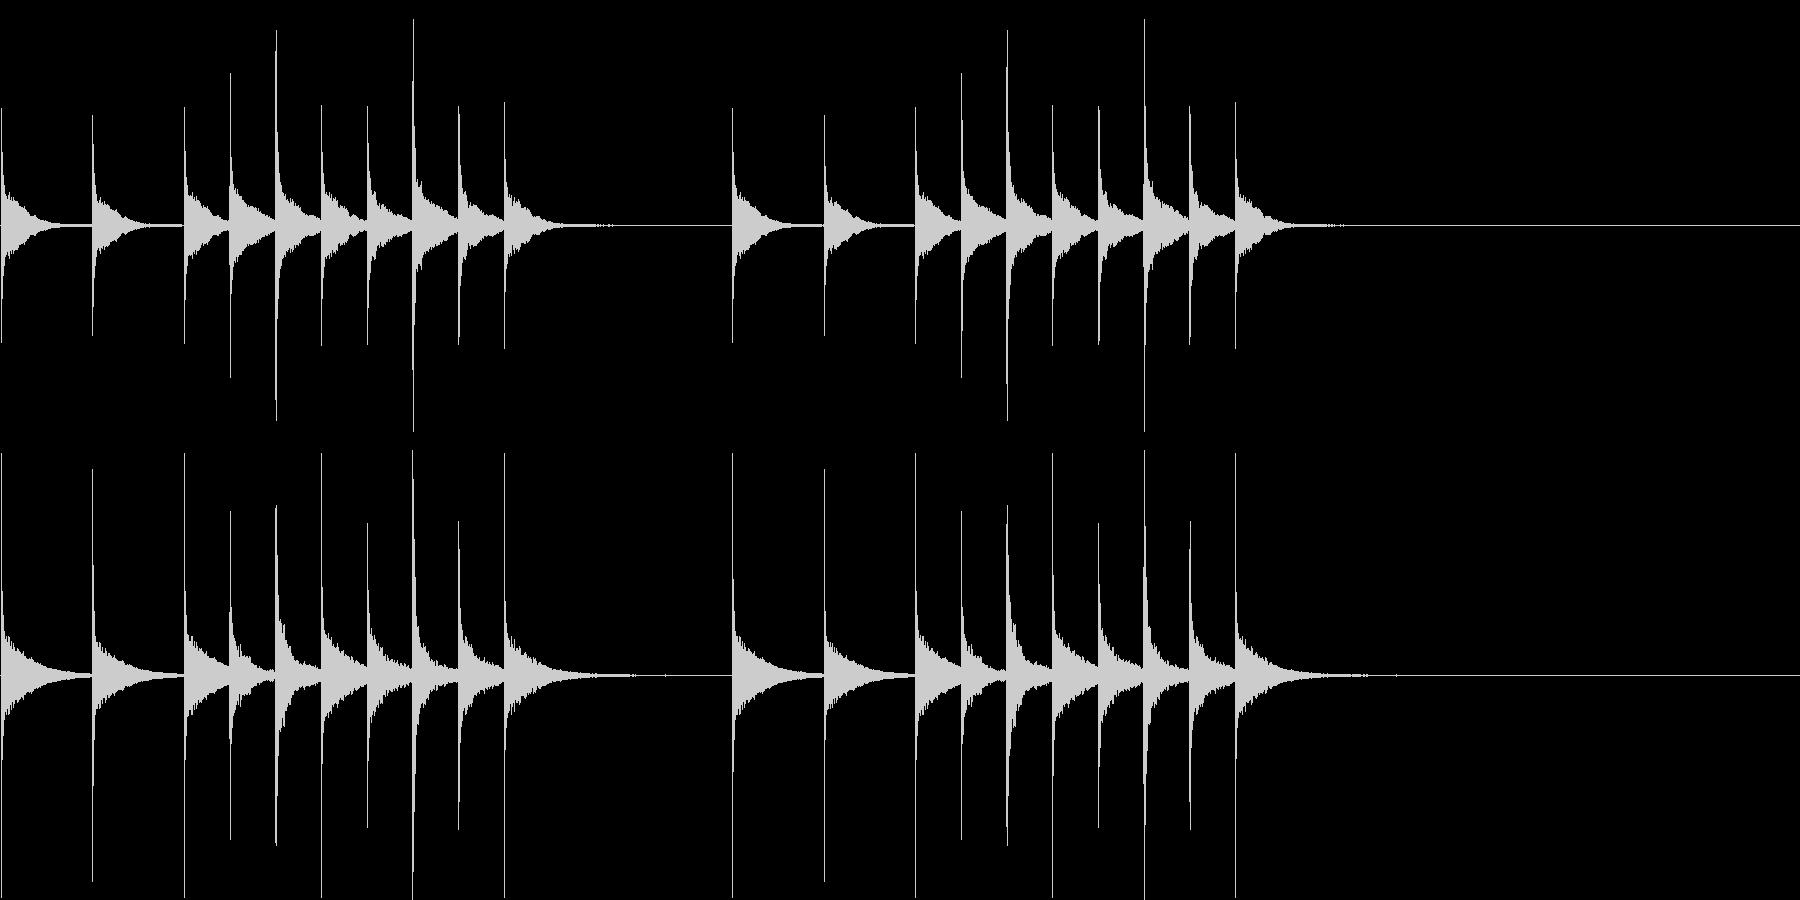 iPhoneみたいな着信音の未再生の波形